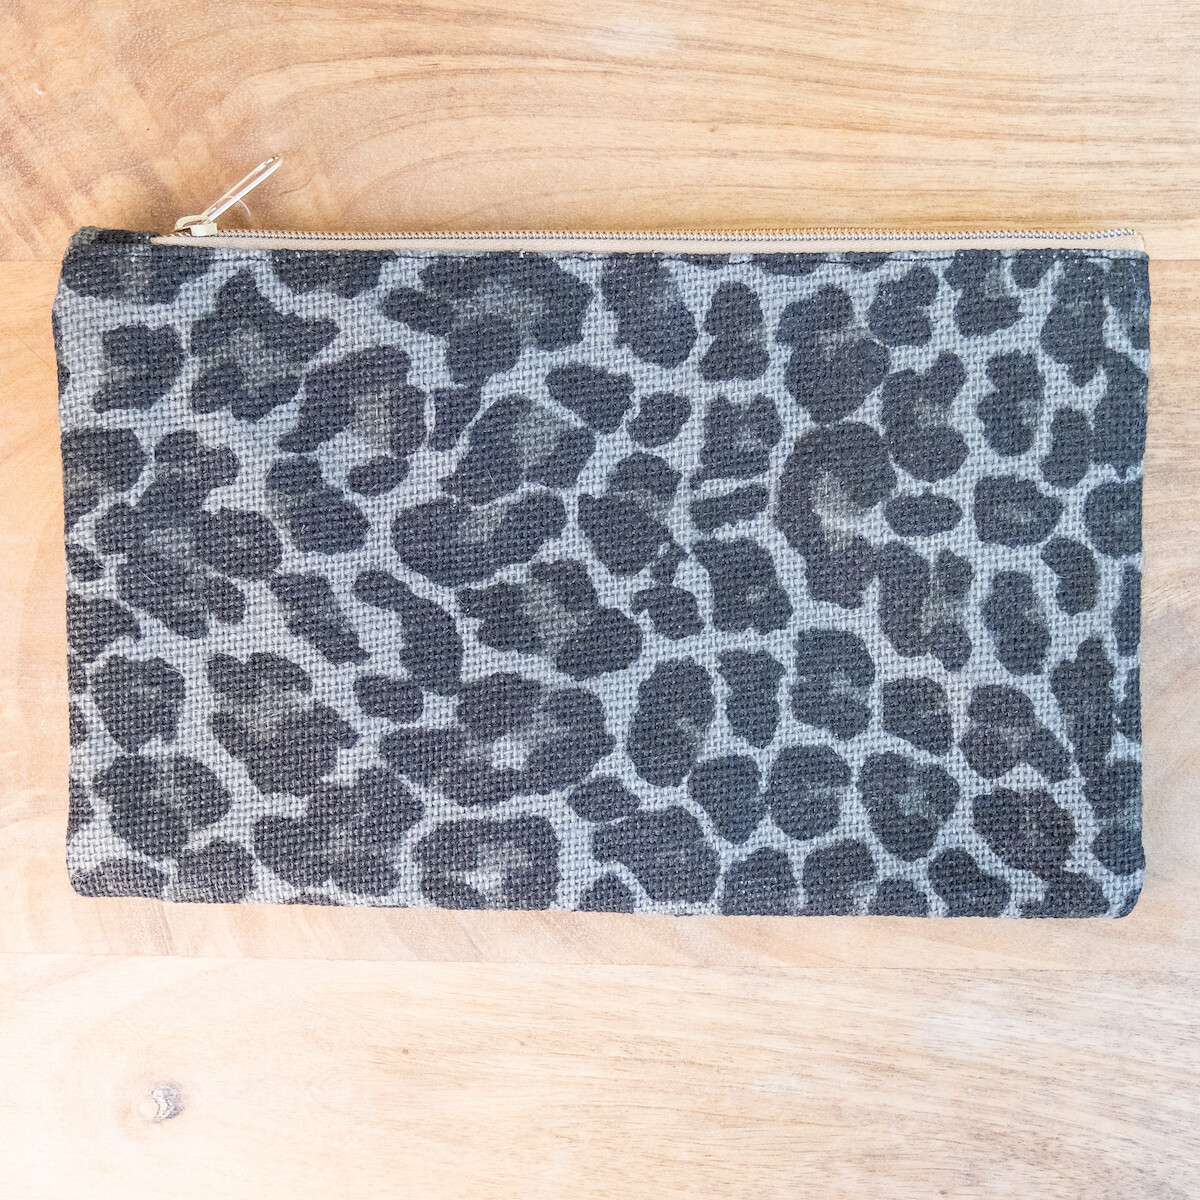 TRS Margo Leopard Cosmetic Bag Grey/Black